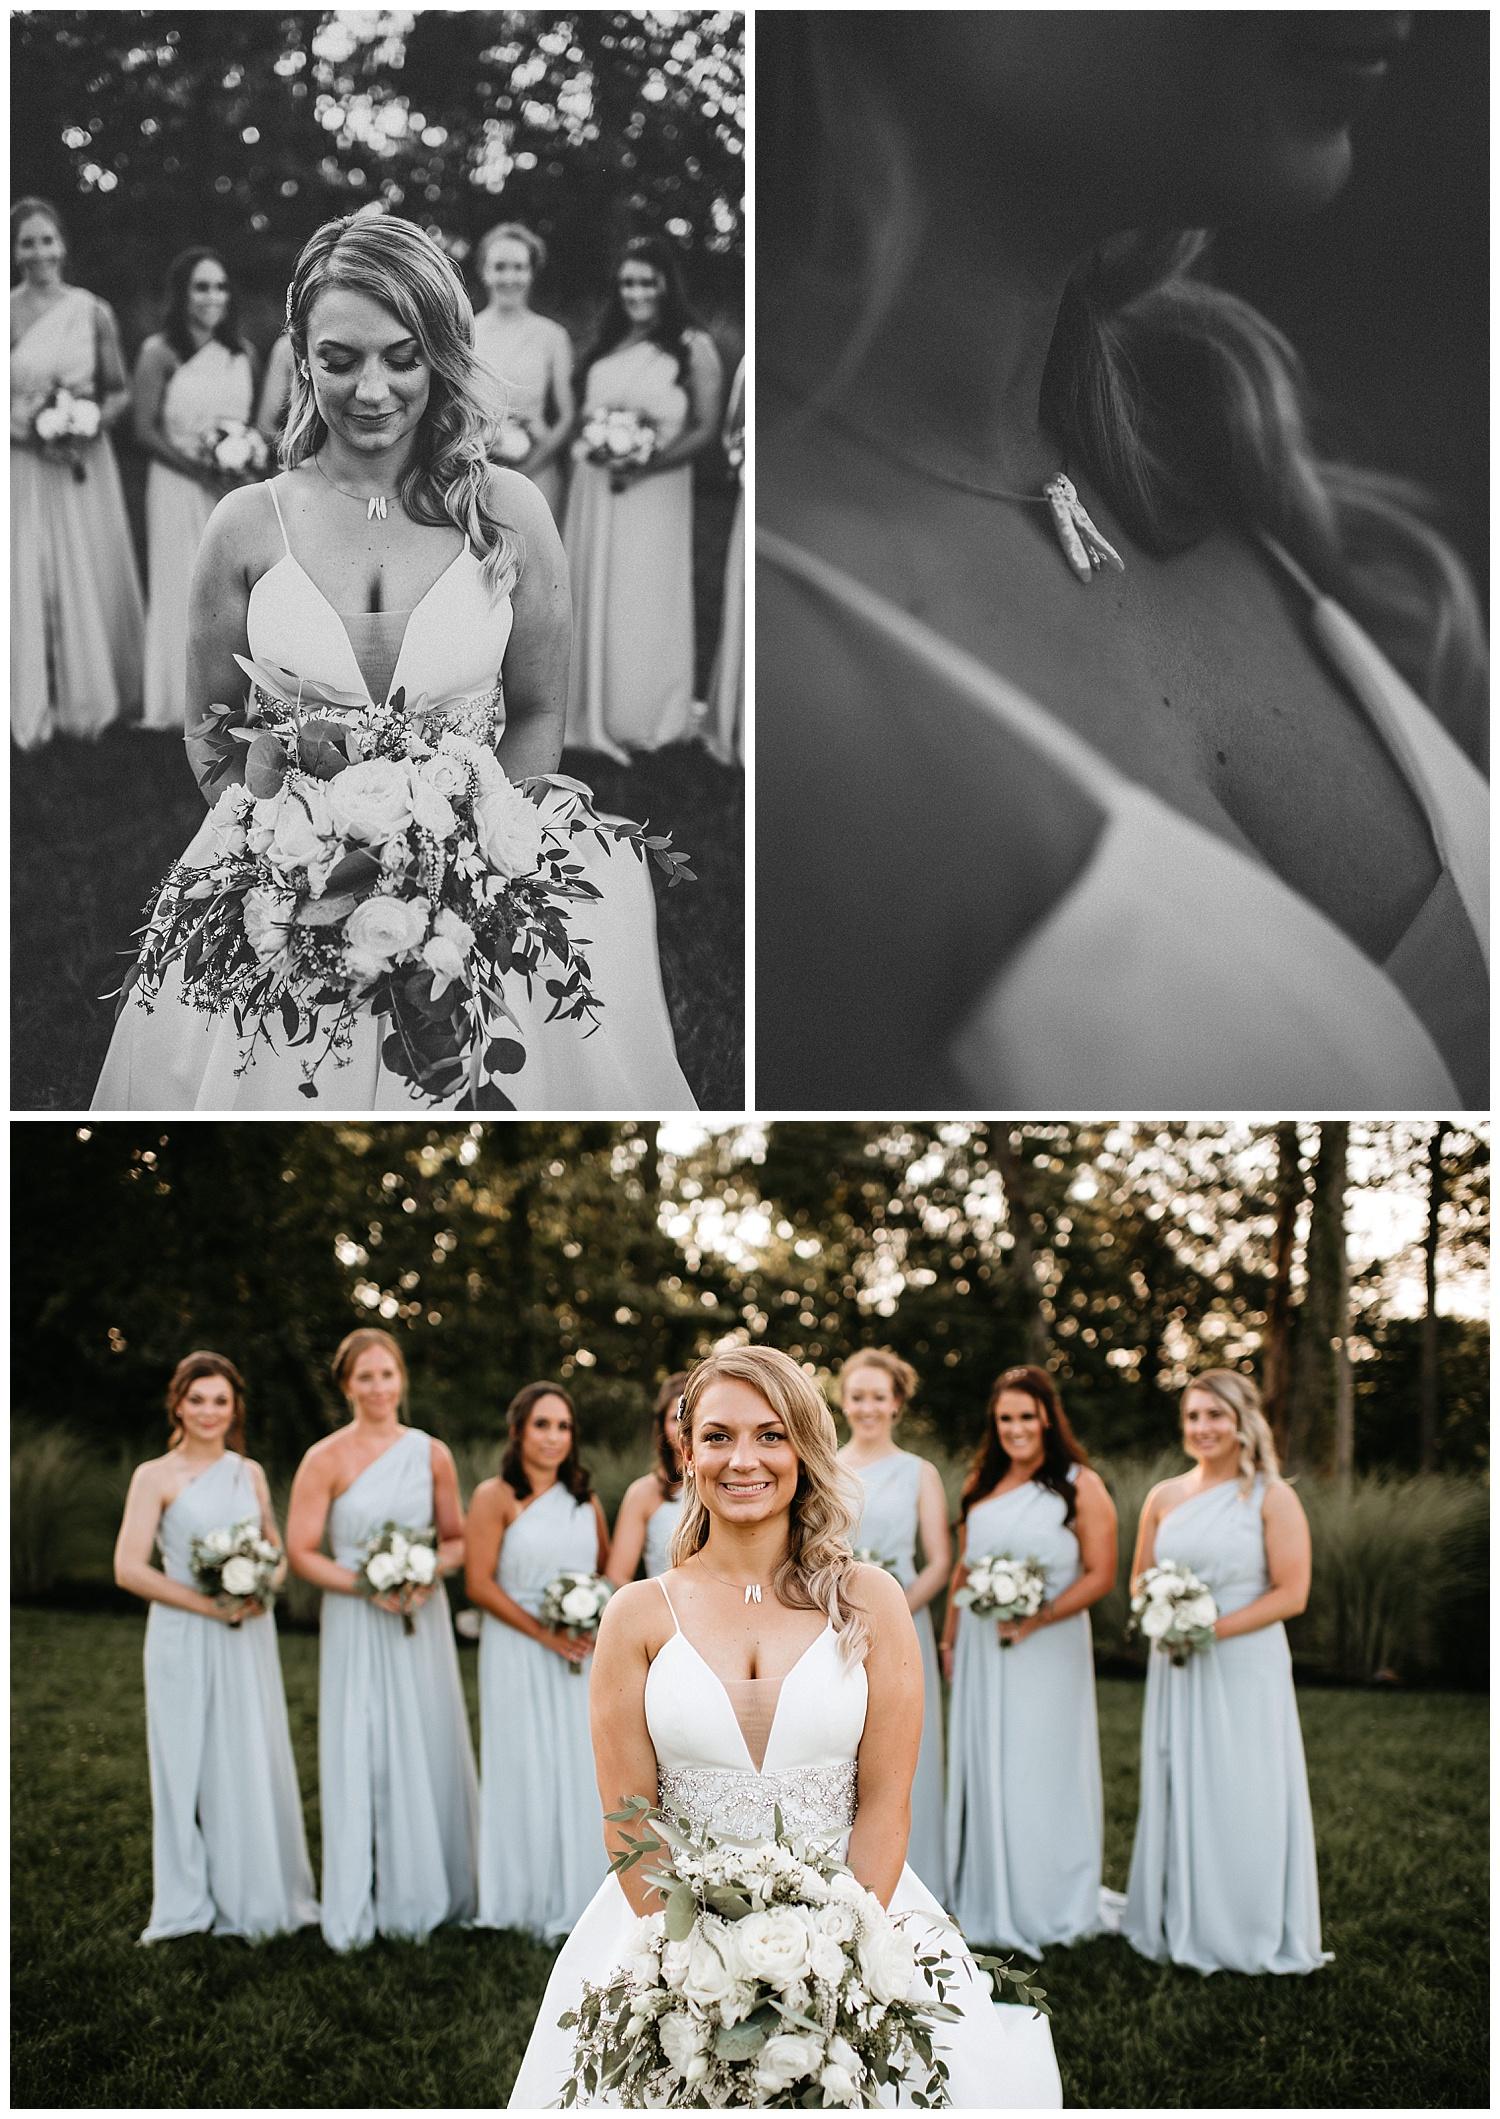 Destination-Wedding-Photographer-in-NEPA-Palmerton-PA_0012.jpg